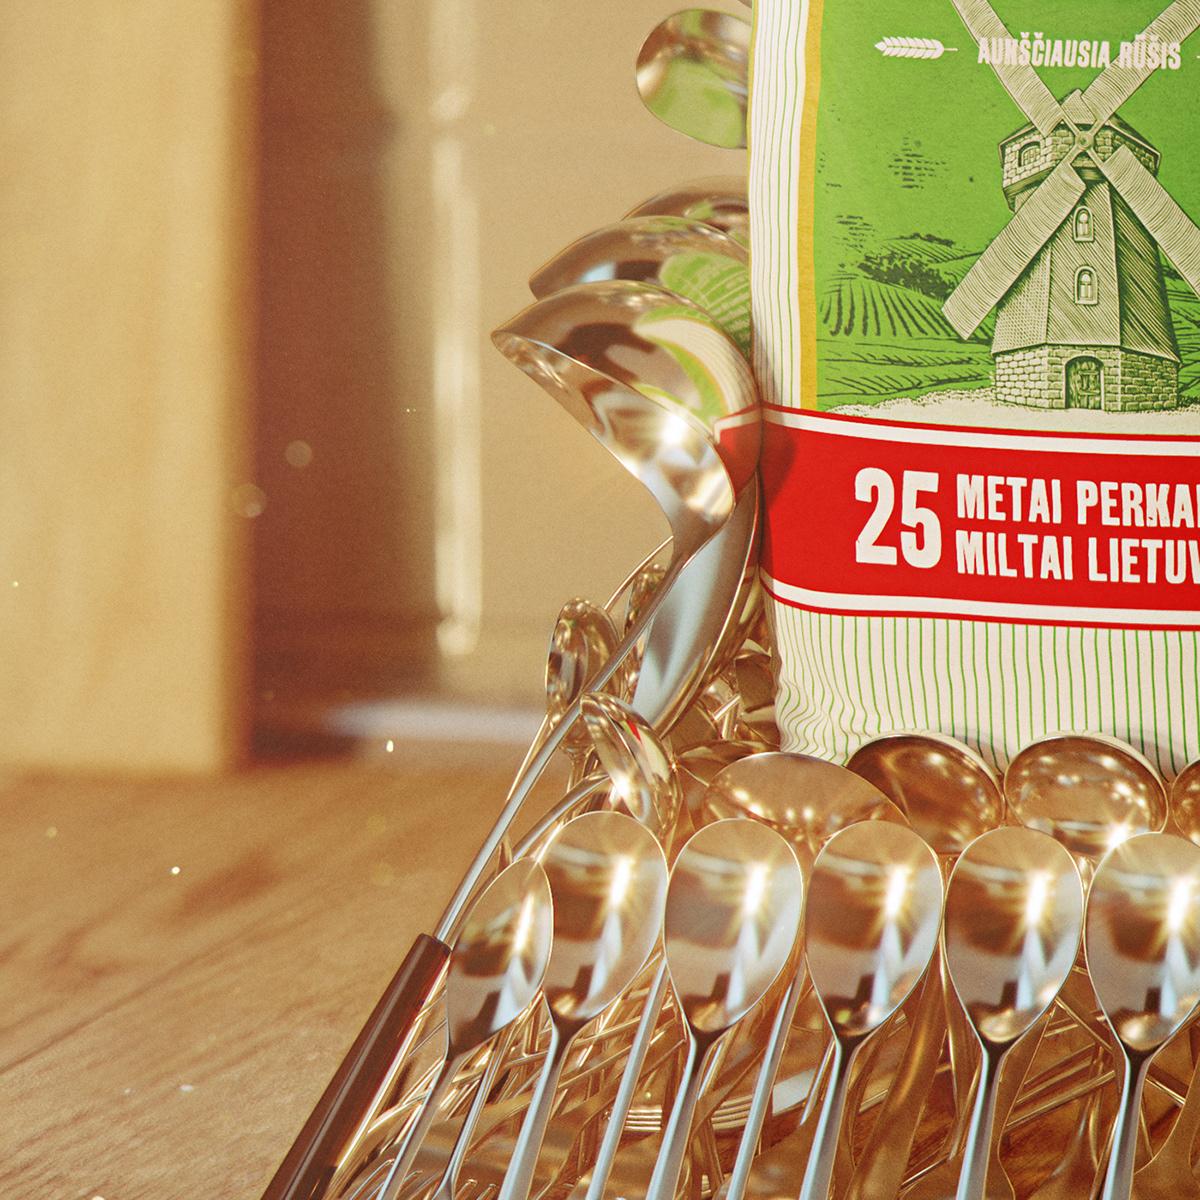 CG ILLUSTRATION  3D Food  table kitchen advertisement spoon